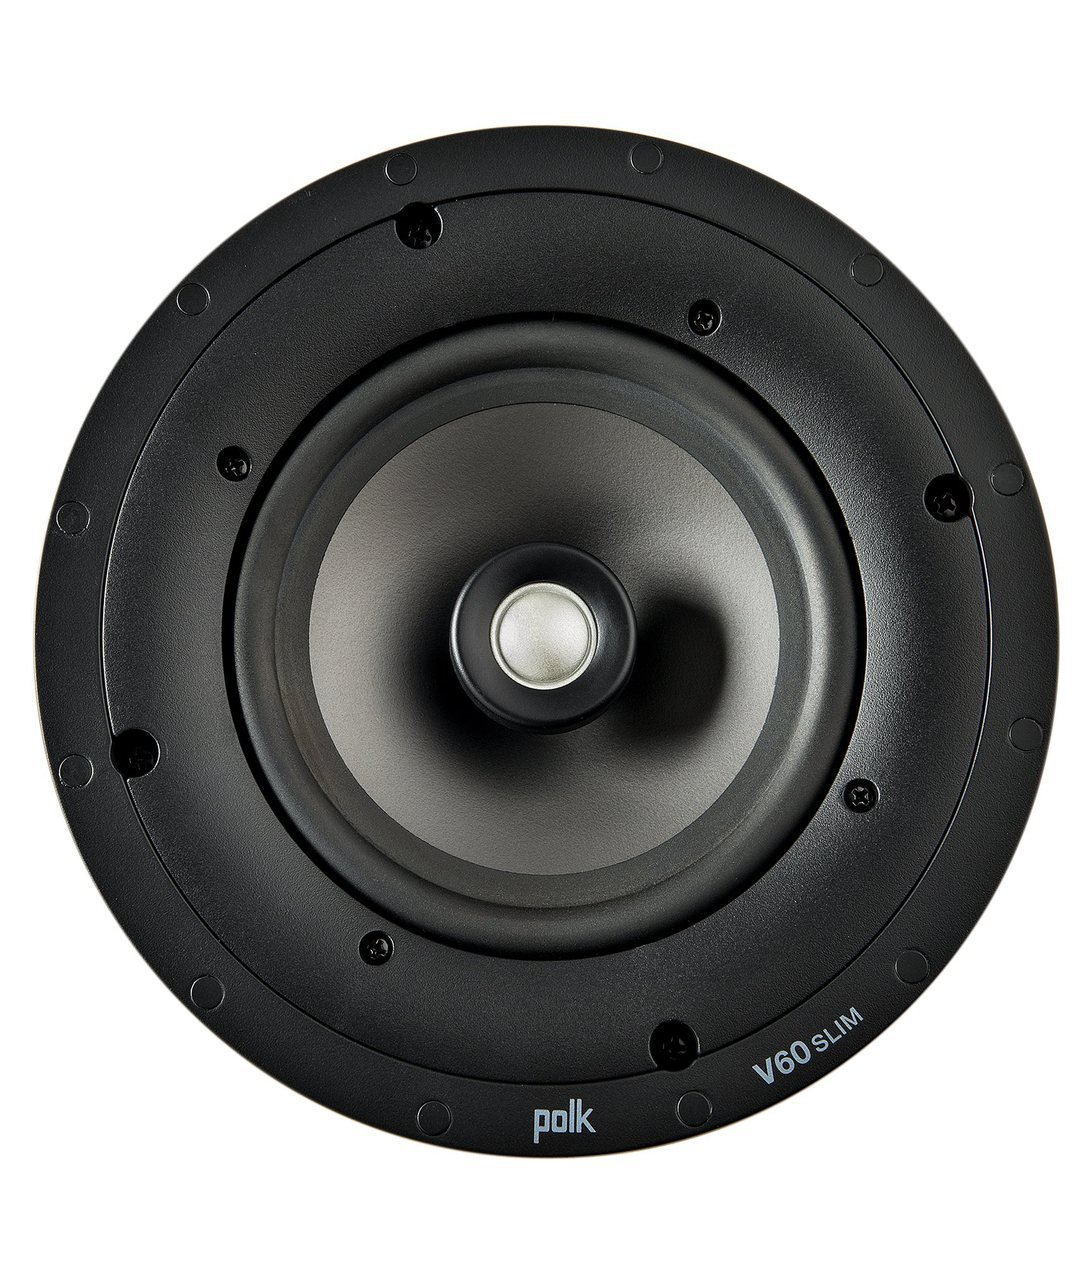 Parlante de Embutir : Polk Audio V 60 Slim x 1